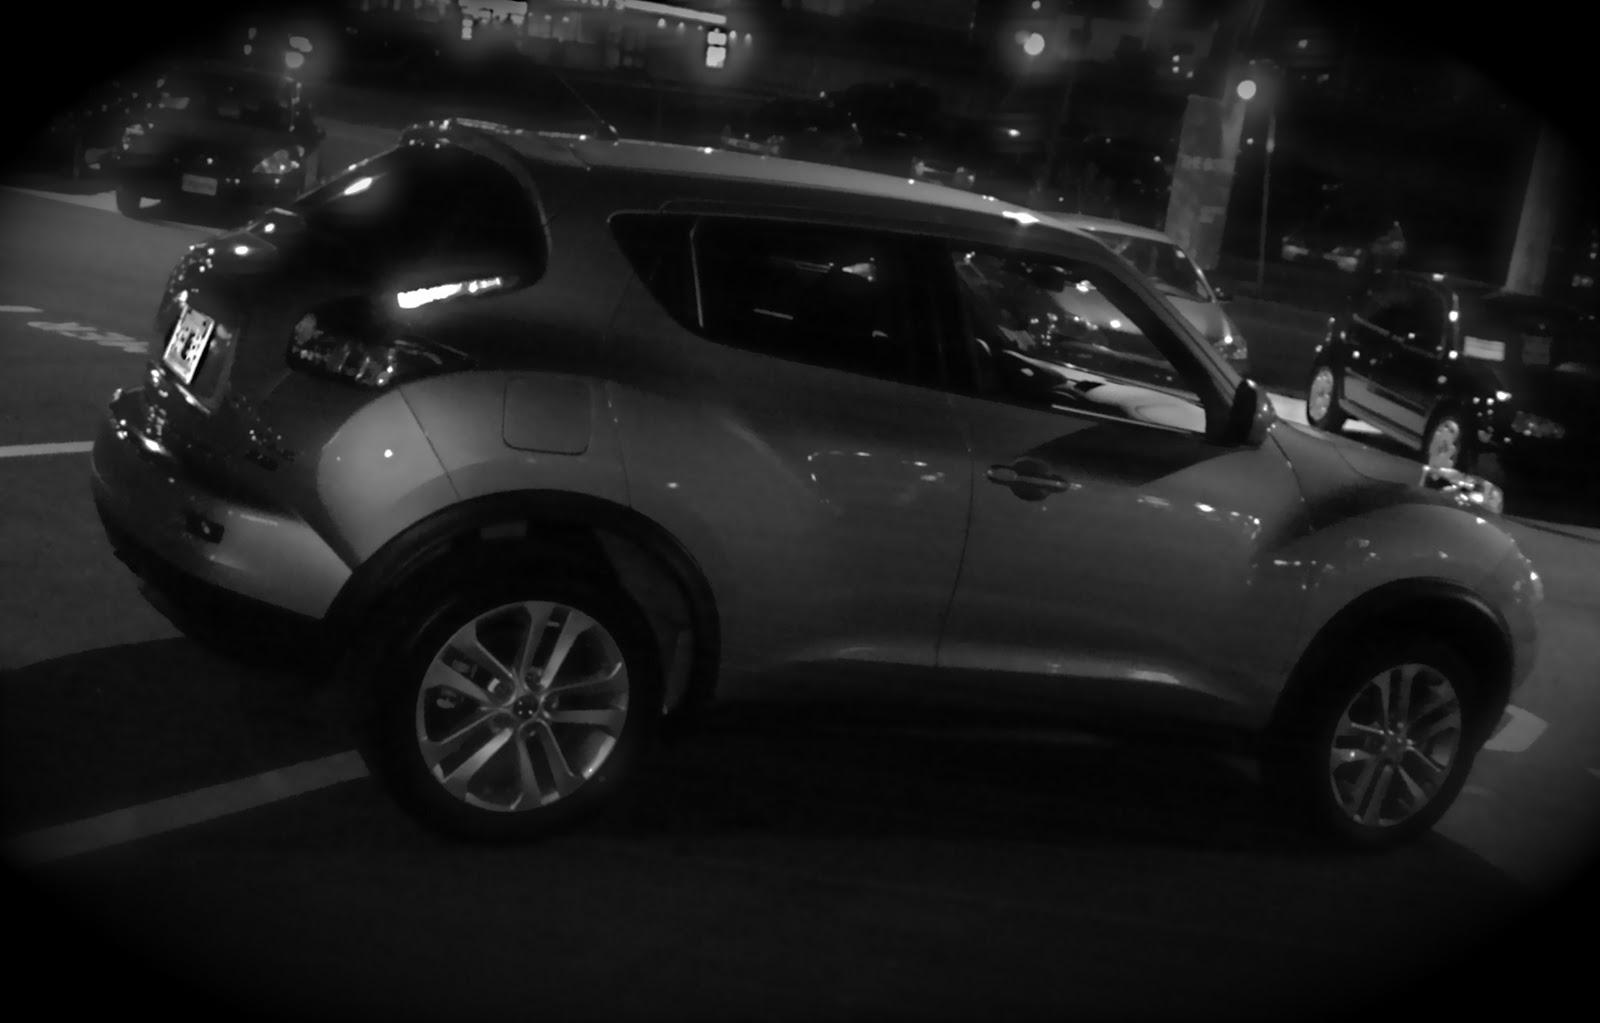 2011 Nissan Juke Driven | GCBC